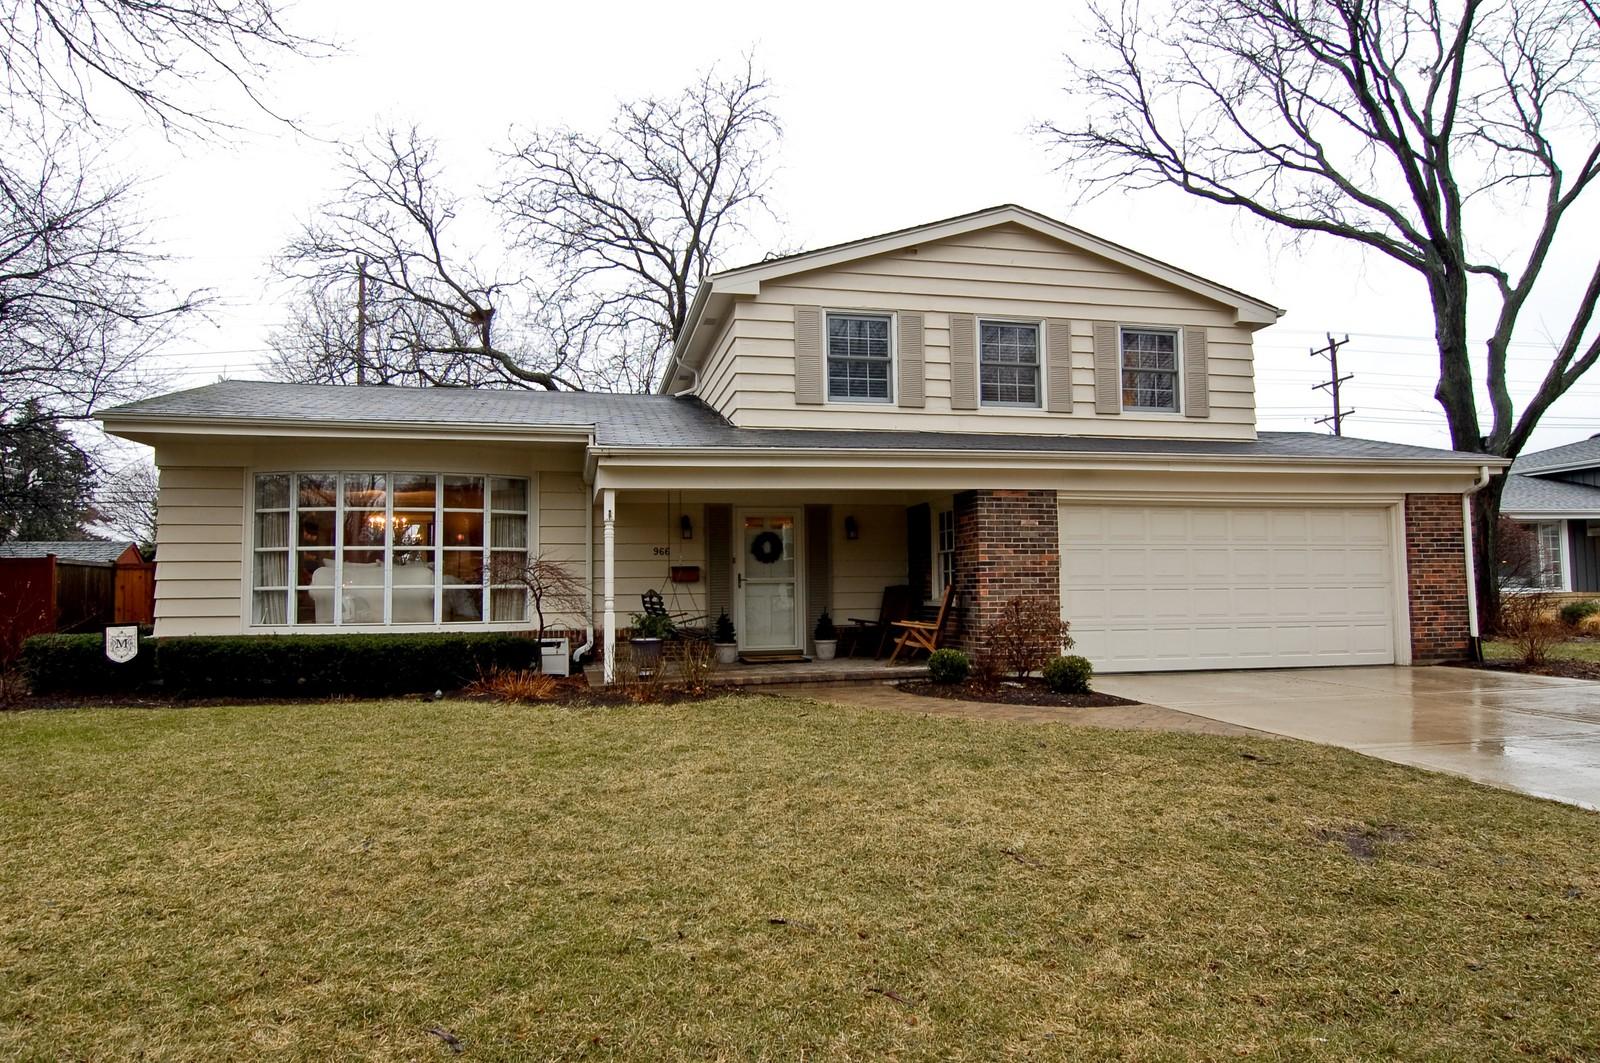 Real Estate Photography - 966 N Topanga, Palatine, IL, 60074 - Front View